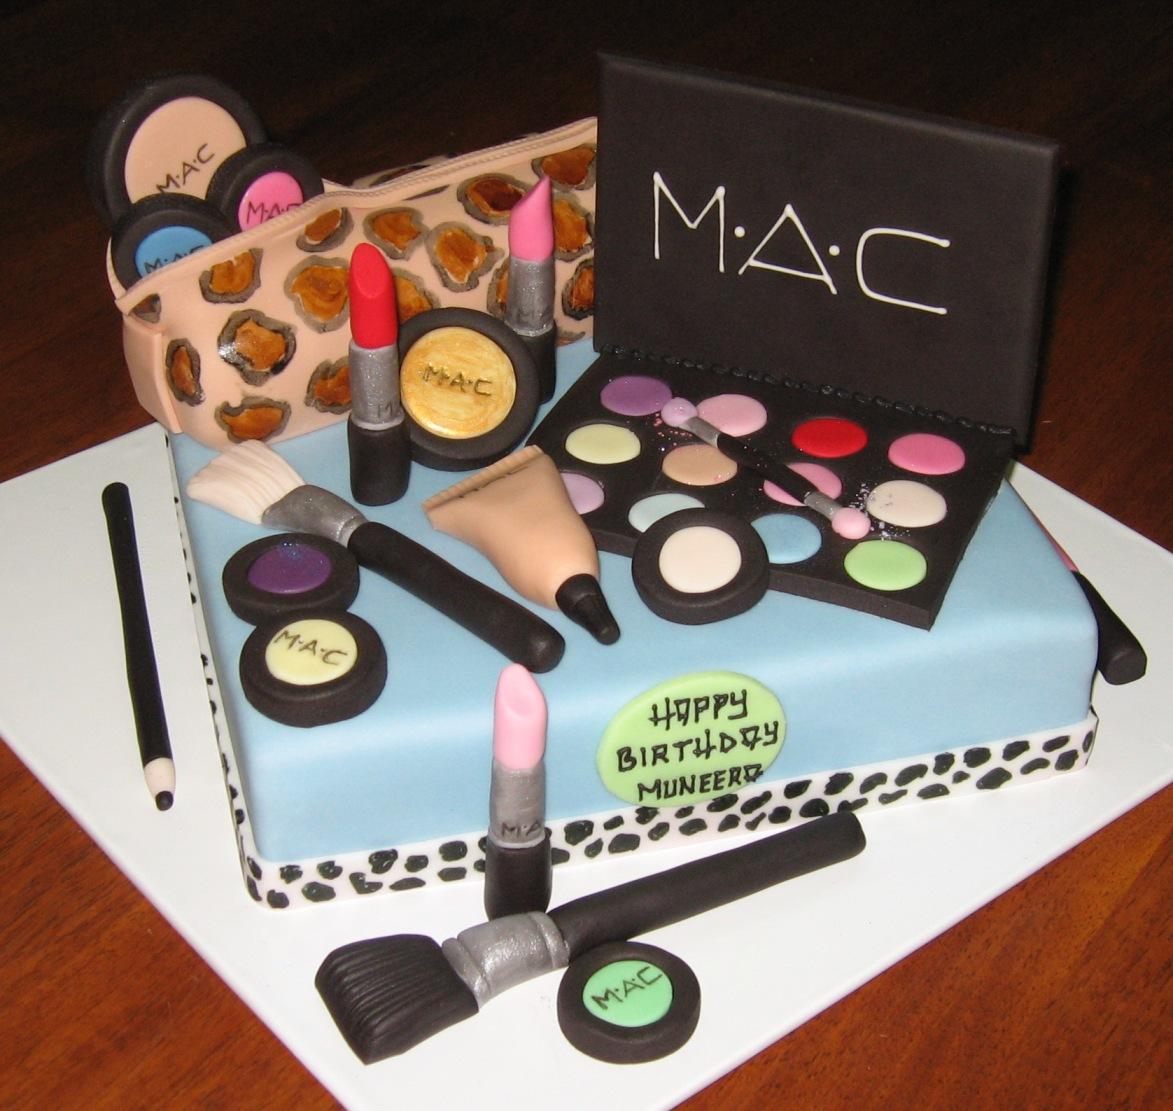 Makeup Cake Images : Let Them Eat Cake: MAC Makeup cake